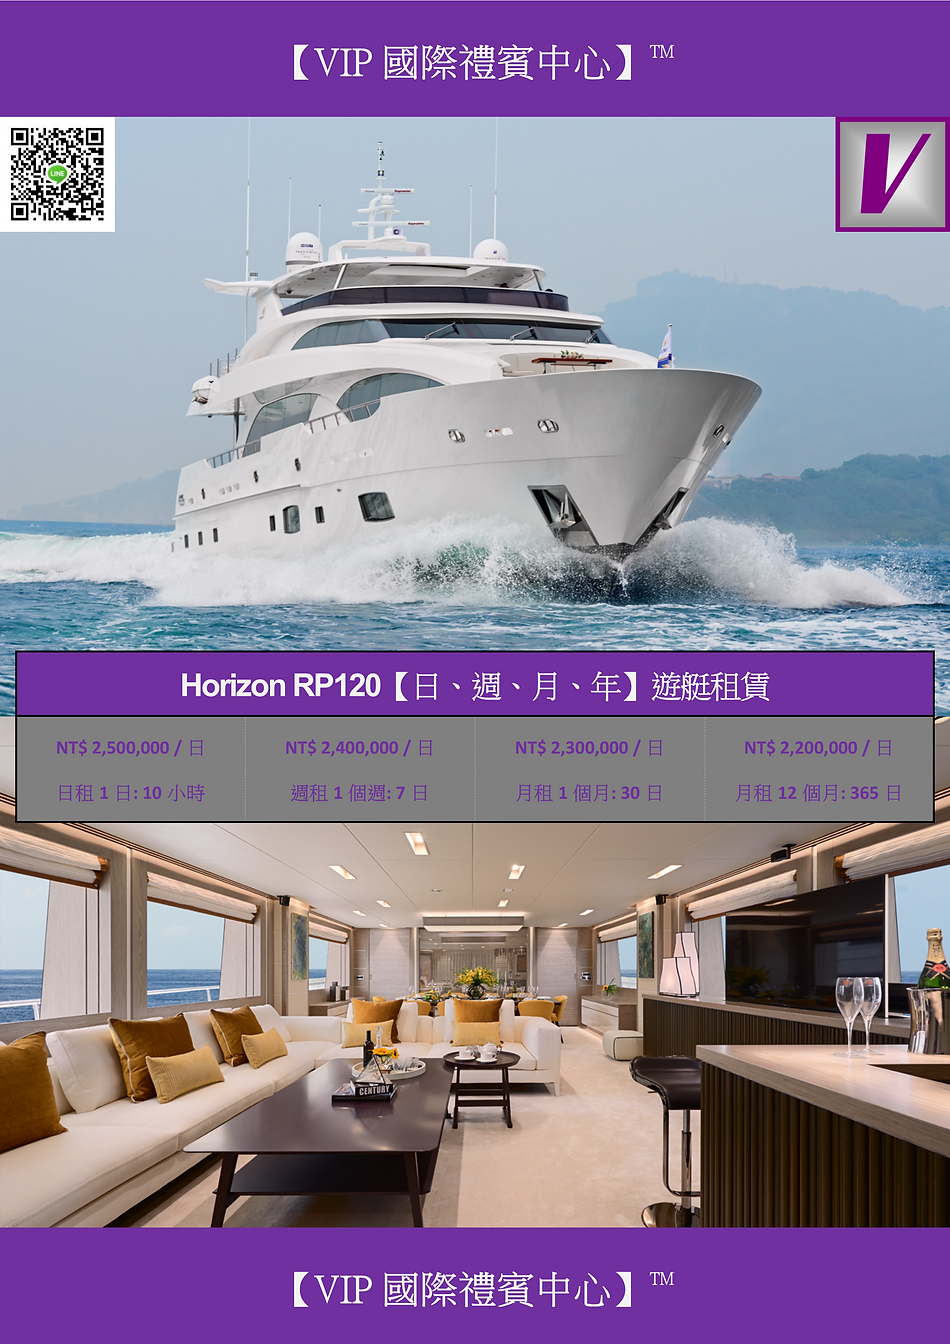 VIP國際禮賓中心 HORIZON RP120 DM.png